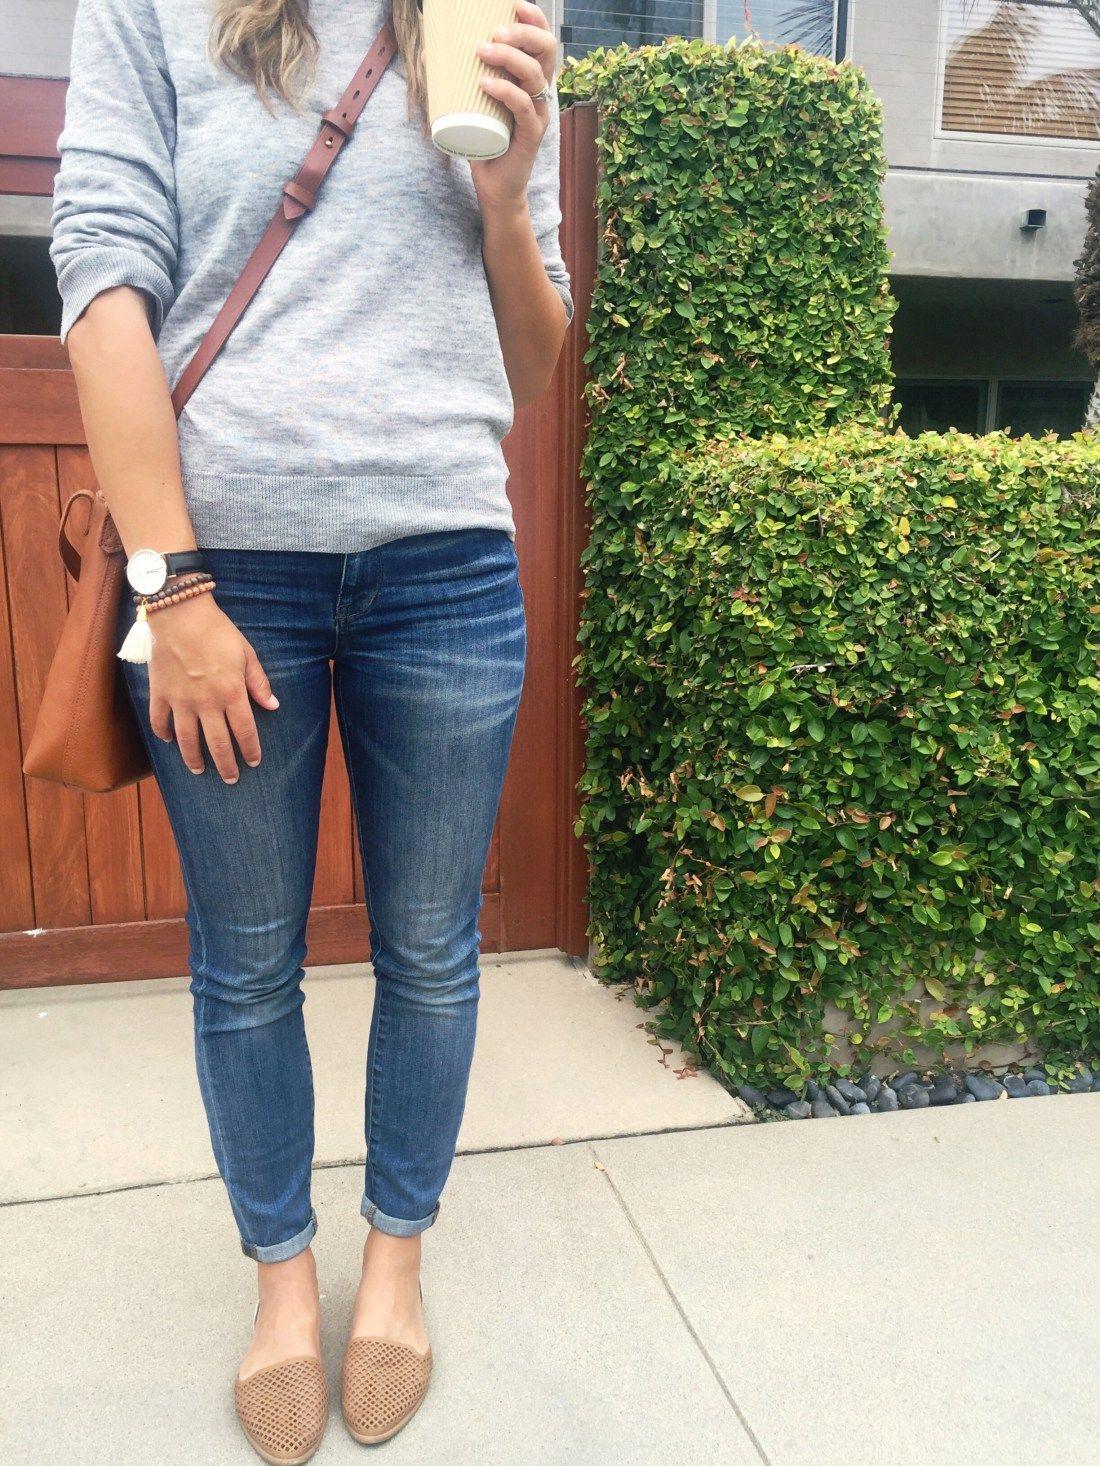 nathalie-run-for-teen-moms-girls-legs-pictures